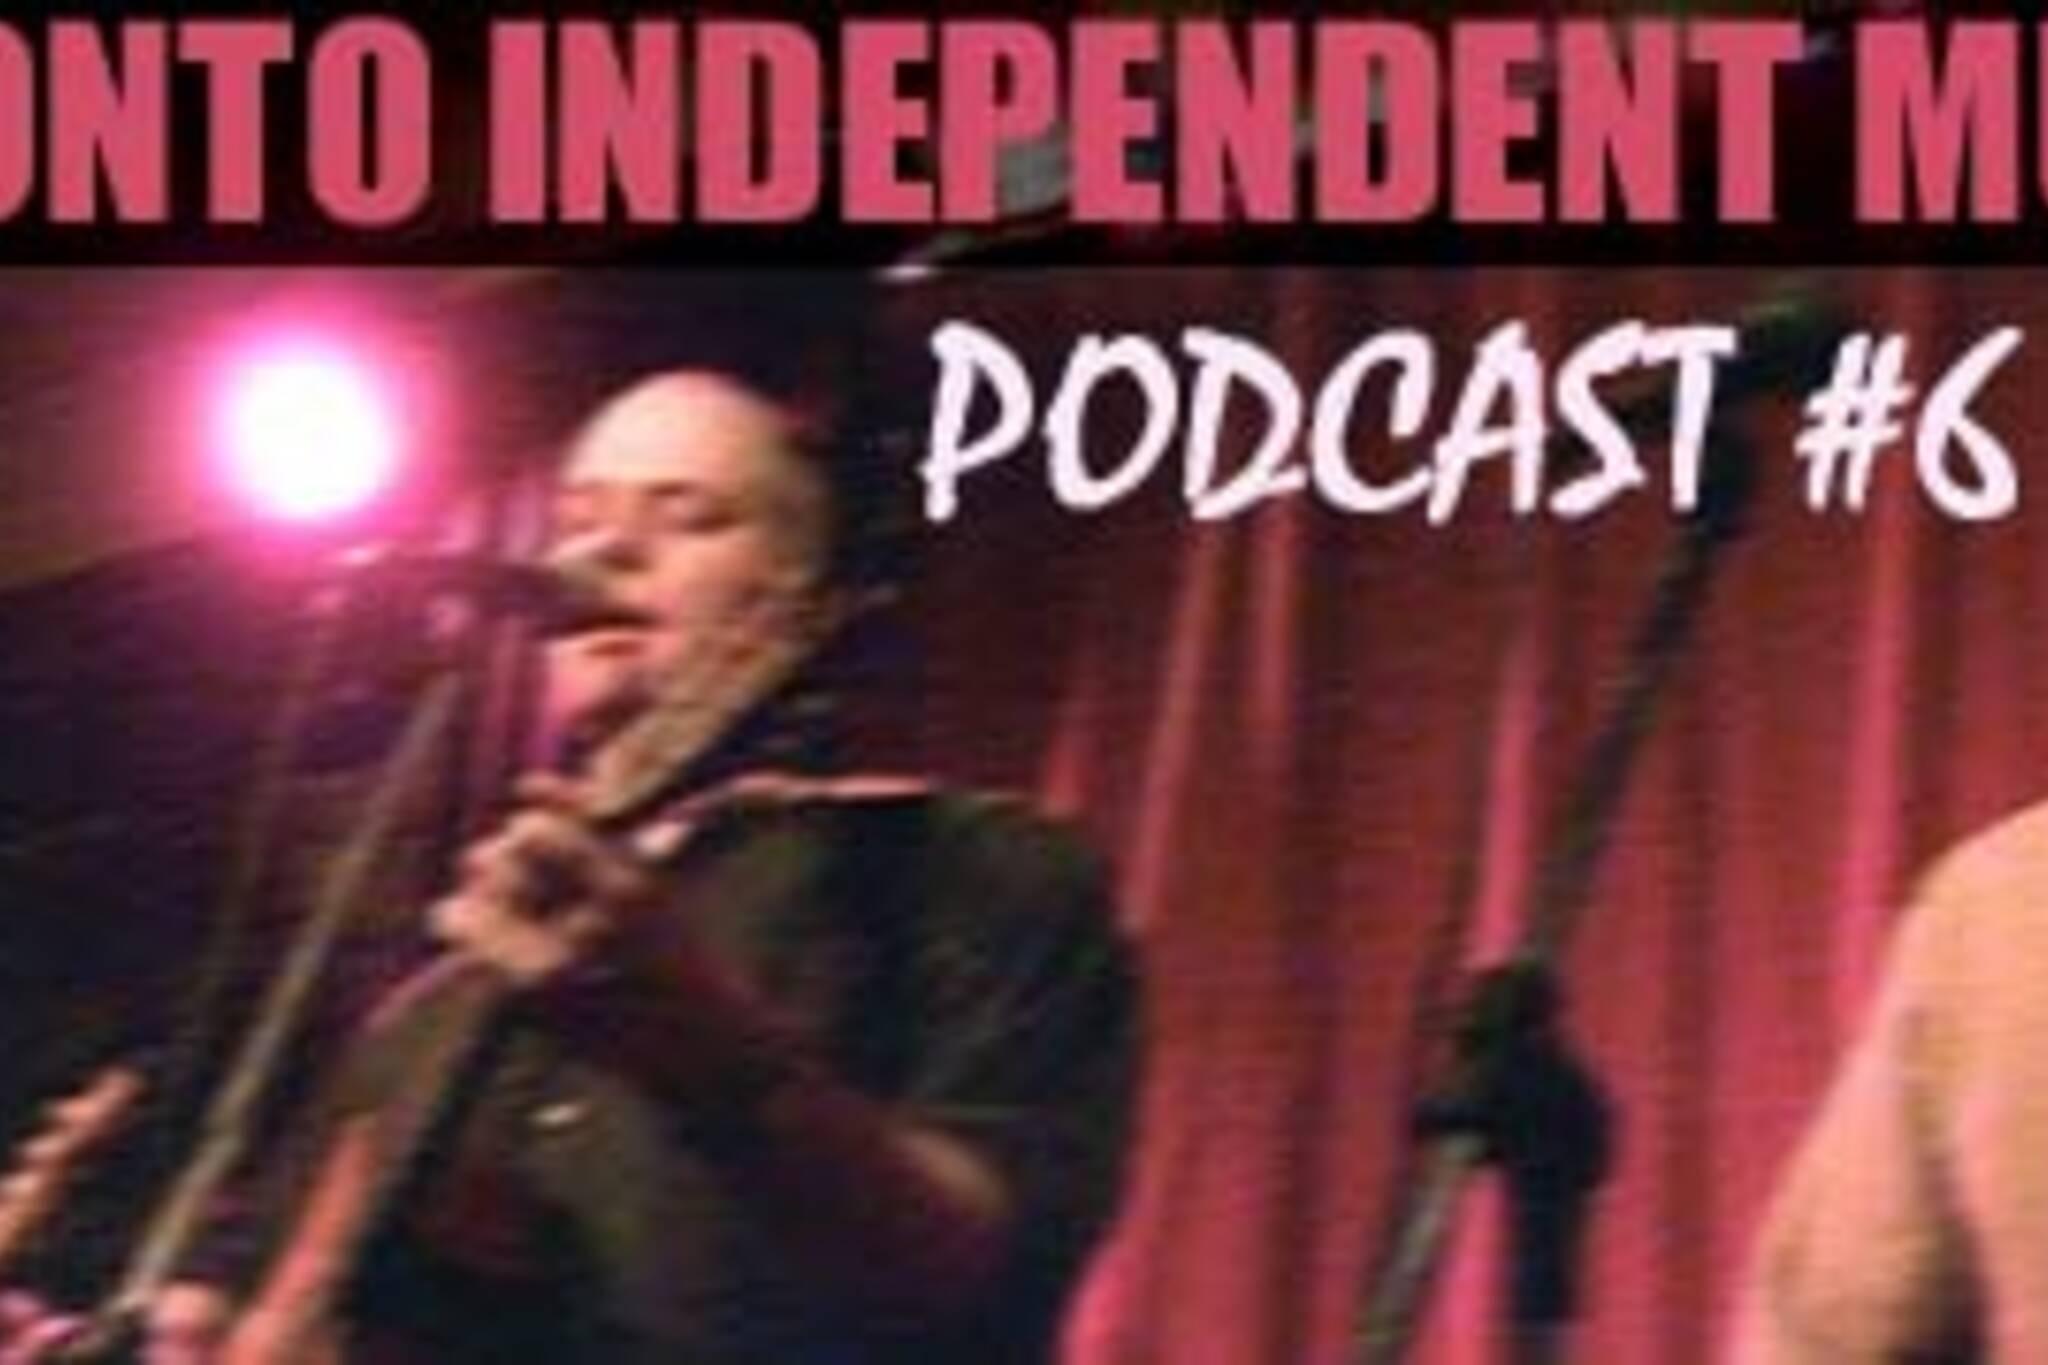 Toronto Independent Music Podcast #6